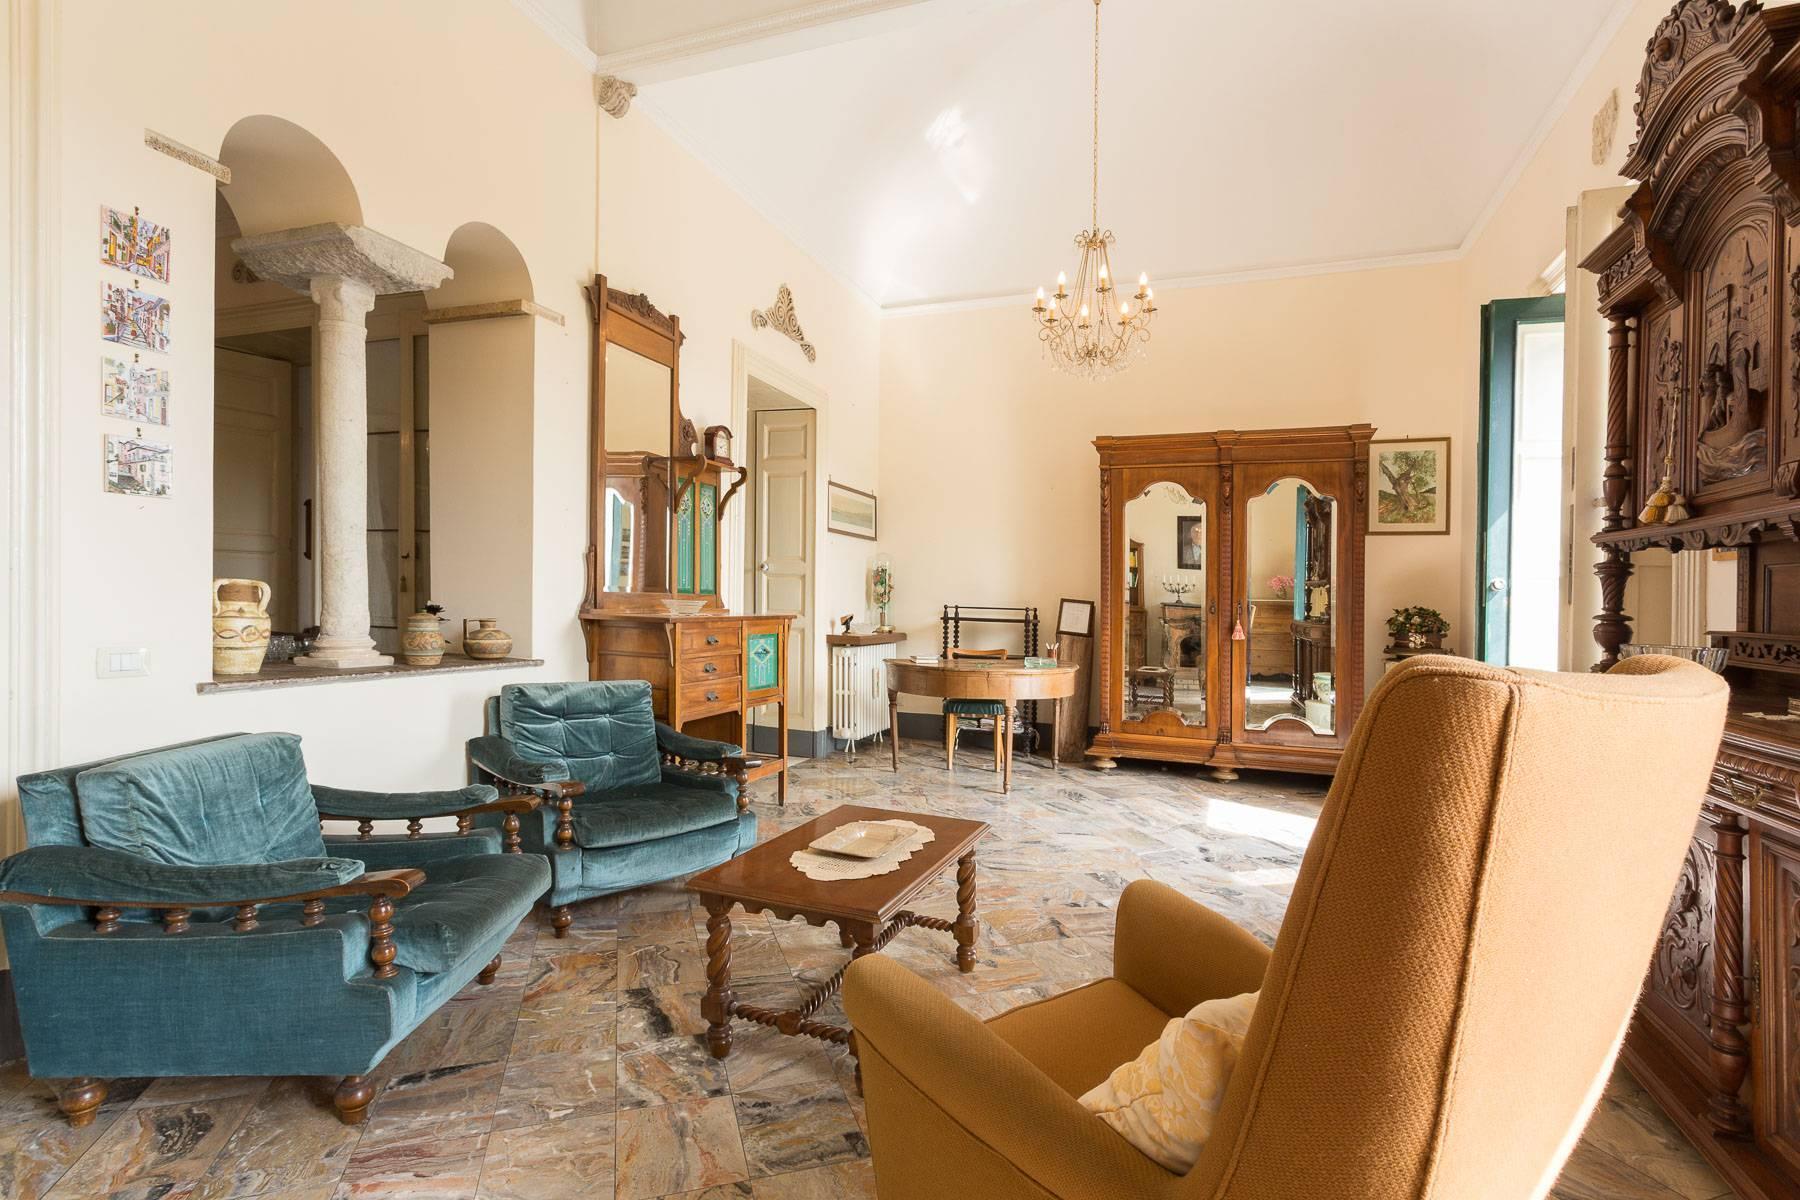 Magnifique Villa sur les pentes de l'Etna - 7